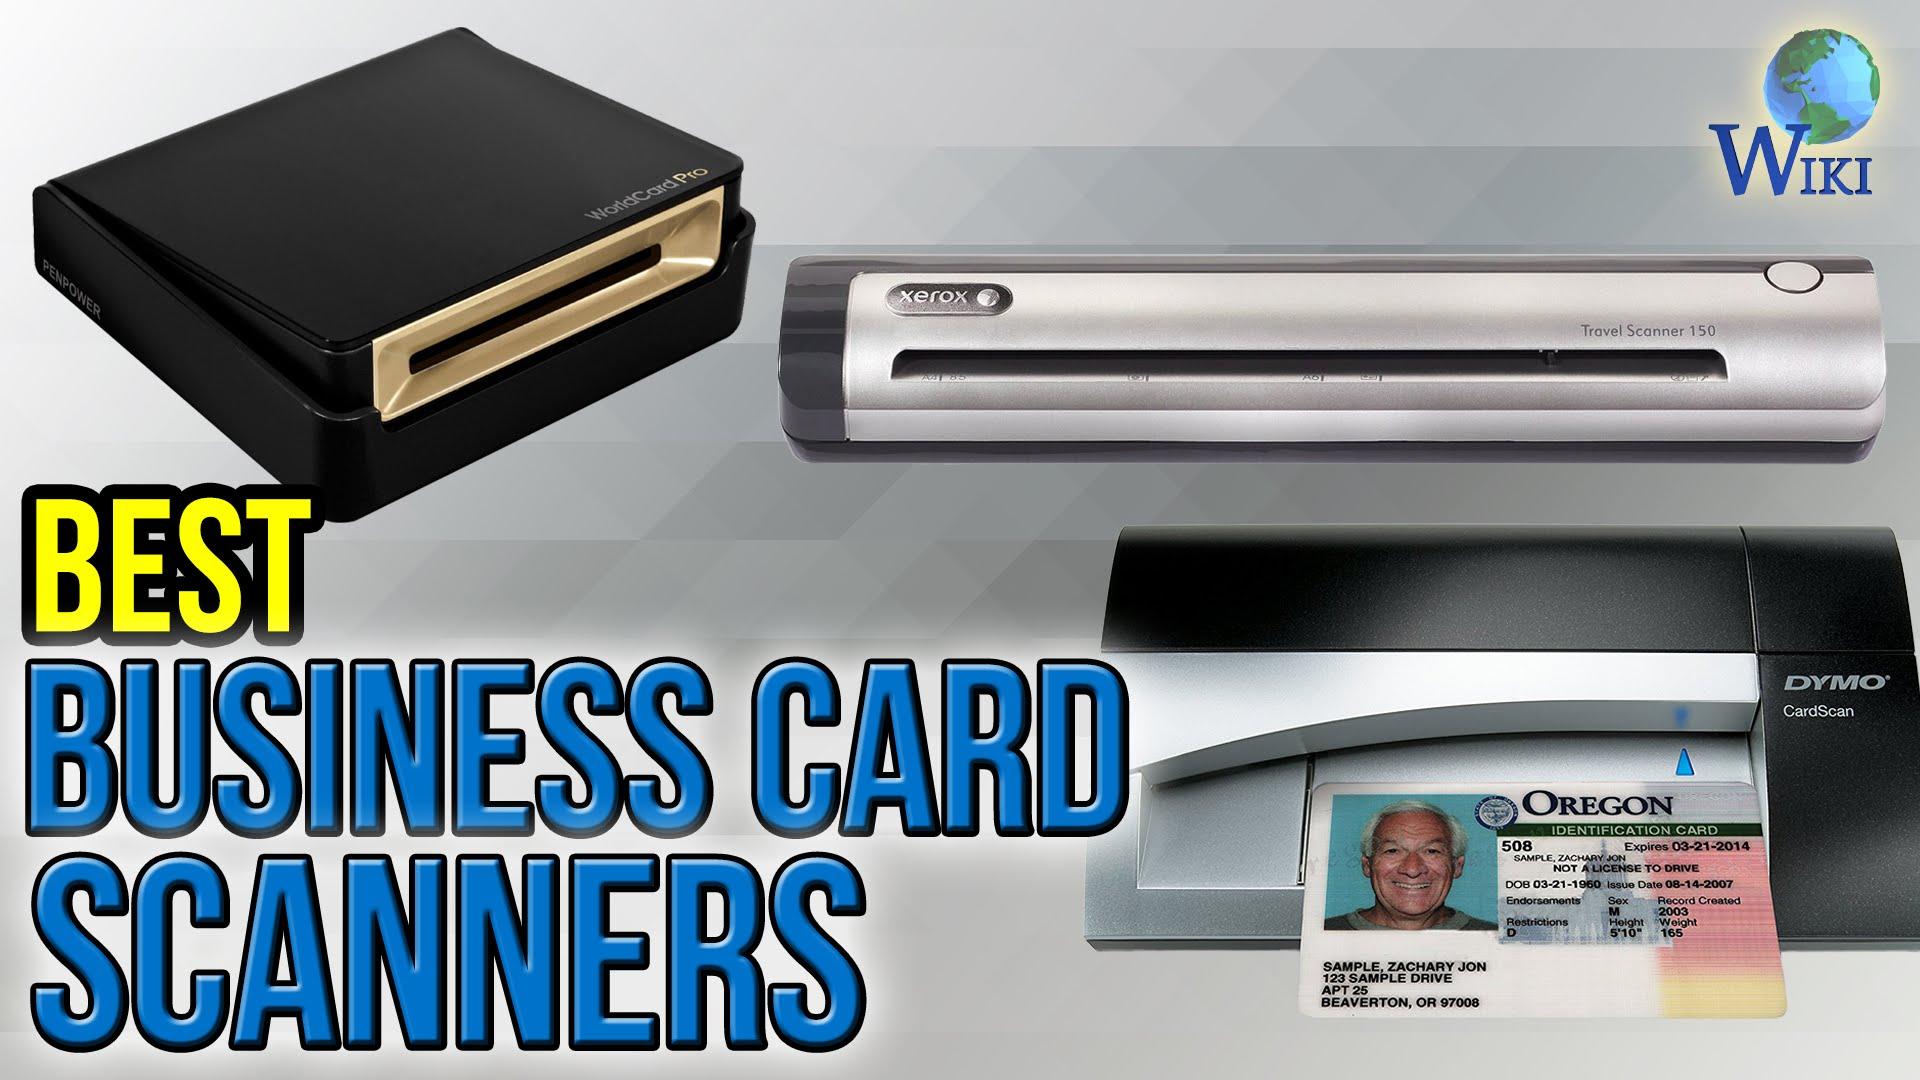 Download best free smart business card reader apps nfc for Best free business card scanner app